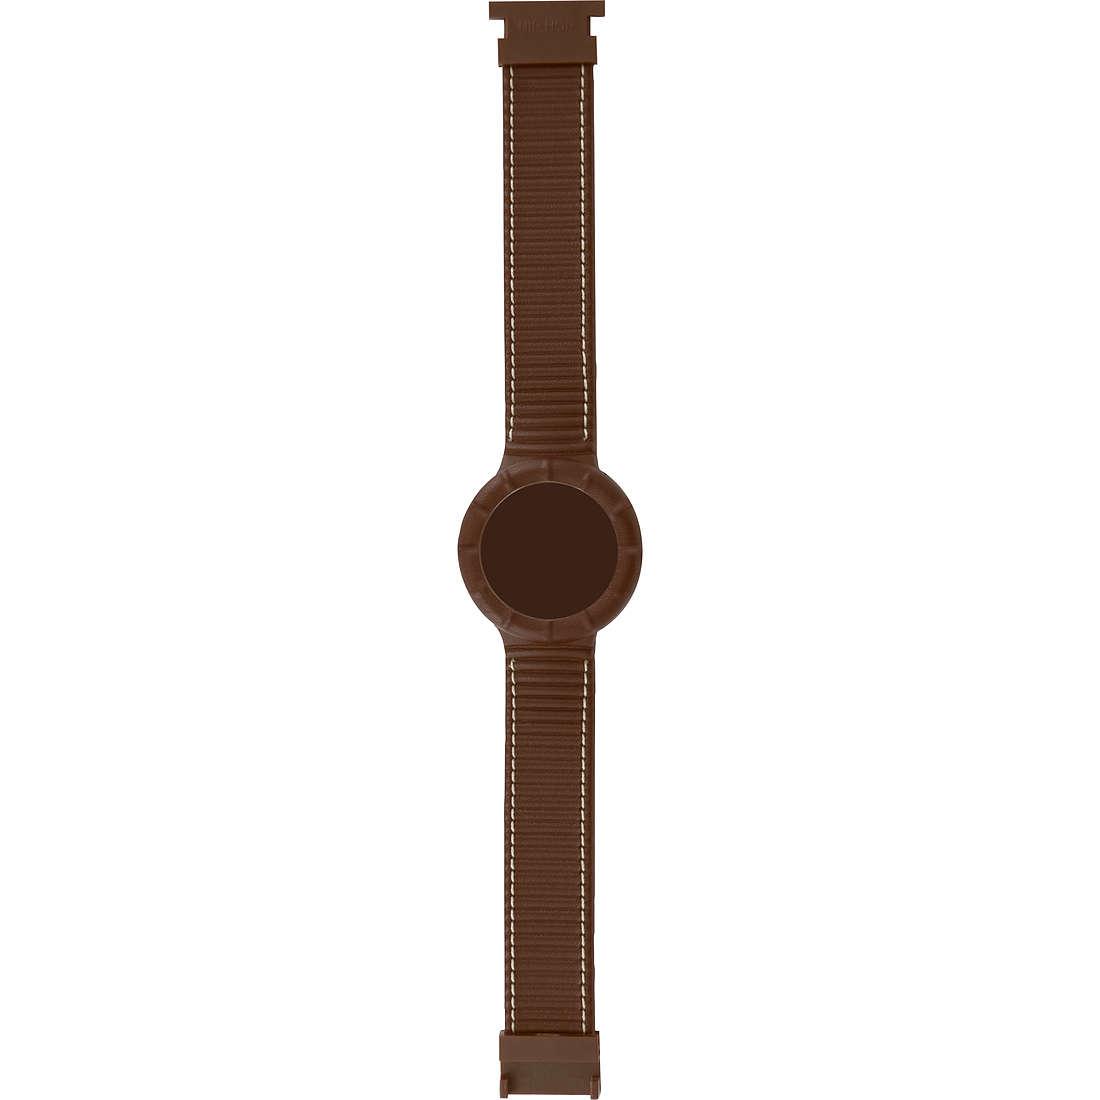 watch watch strap unisex Hip Hop Leather HBU0206